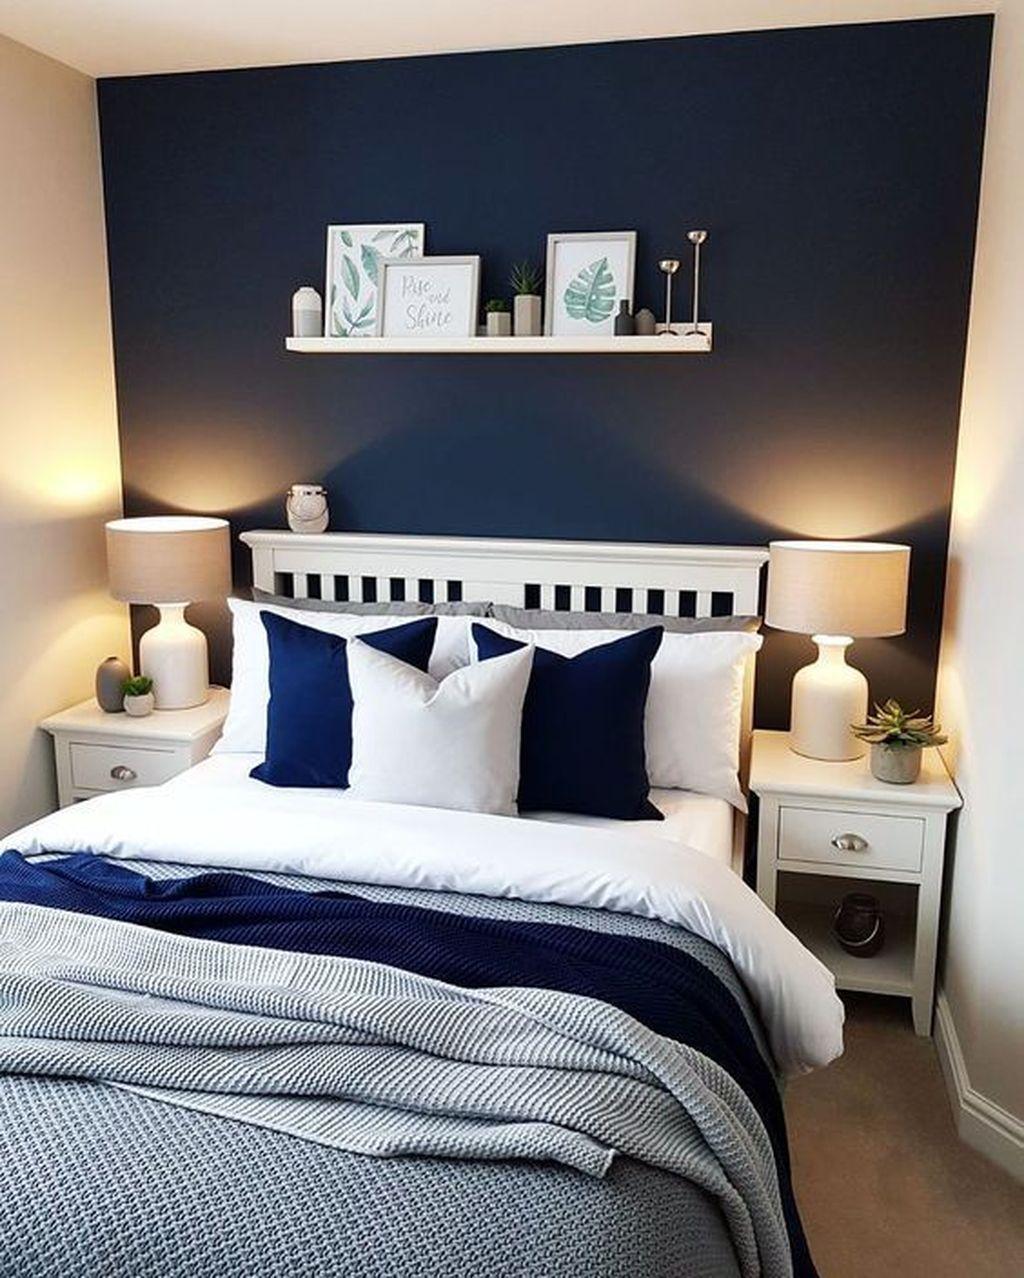 38 Stunning Blue Bedroom Decorating Ideas Tvdecoo Kamar Tidur Biru Ide Kamar Tidur Kamar Tidur Bernuansa Biru Bedroom decorating ideas blue